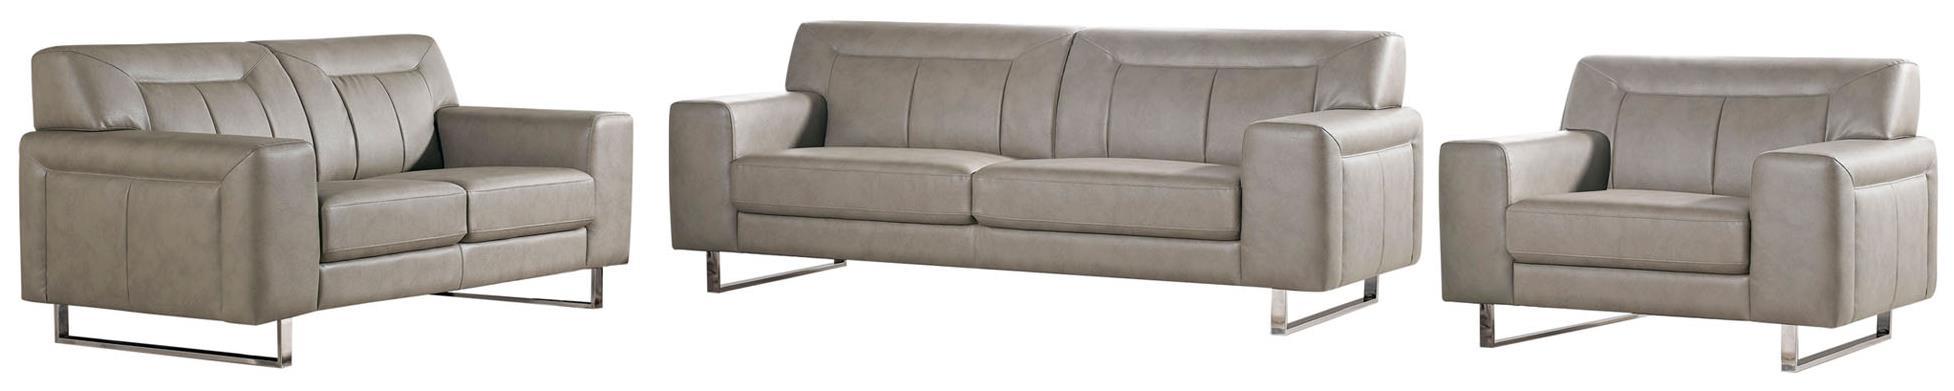 Diamond Sofa Vera Leatherette Sofa/Loveseat/Chair 3PC Set - Item Number: VERASLCSS